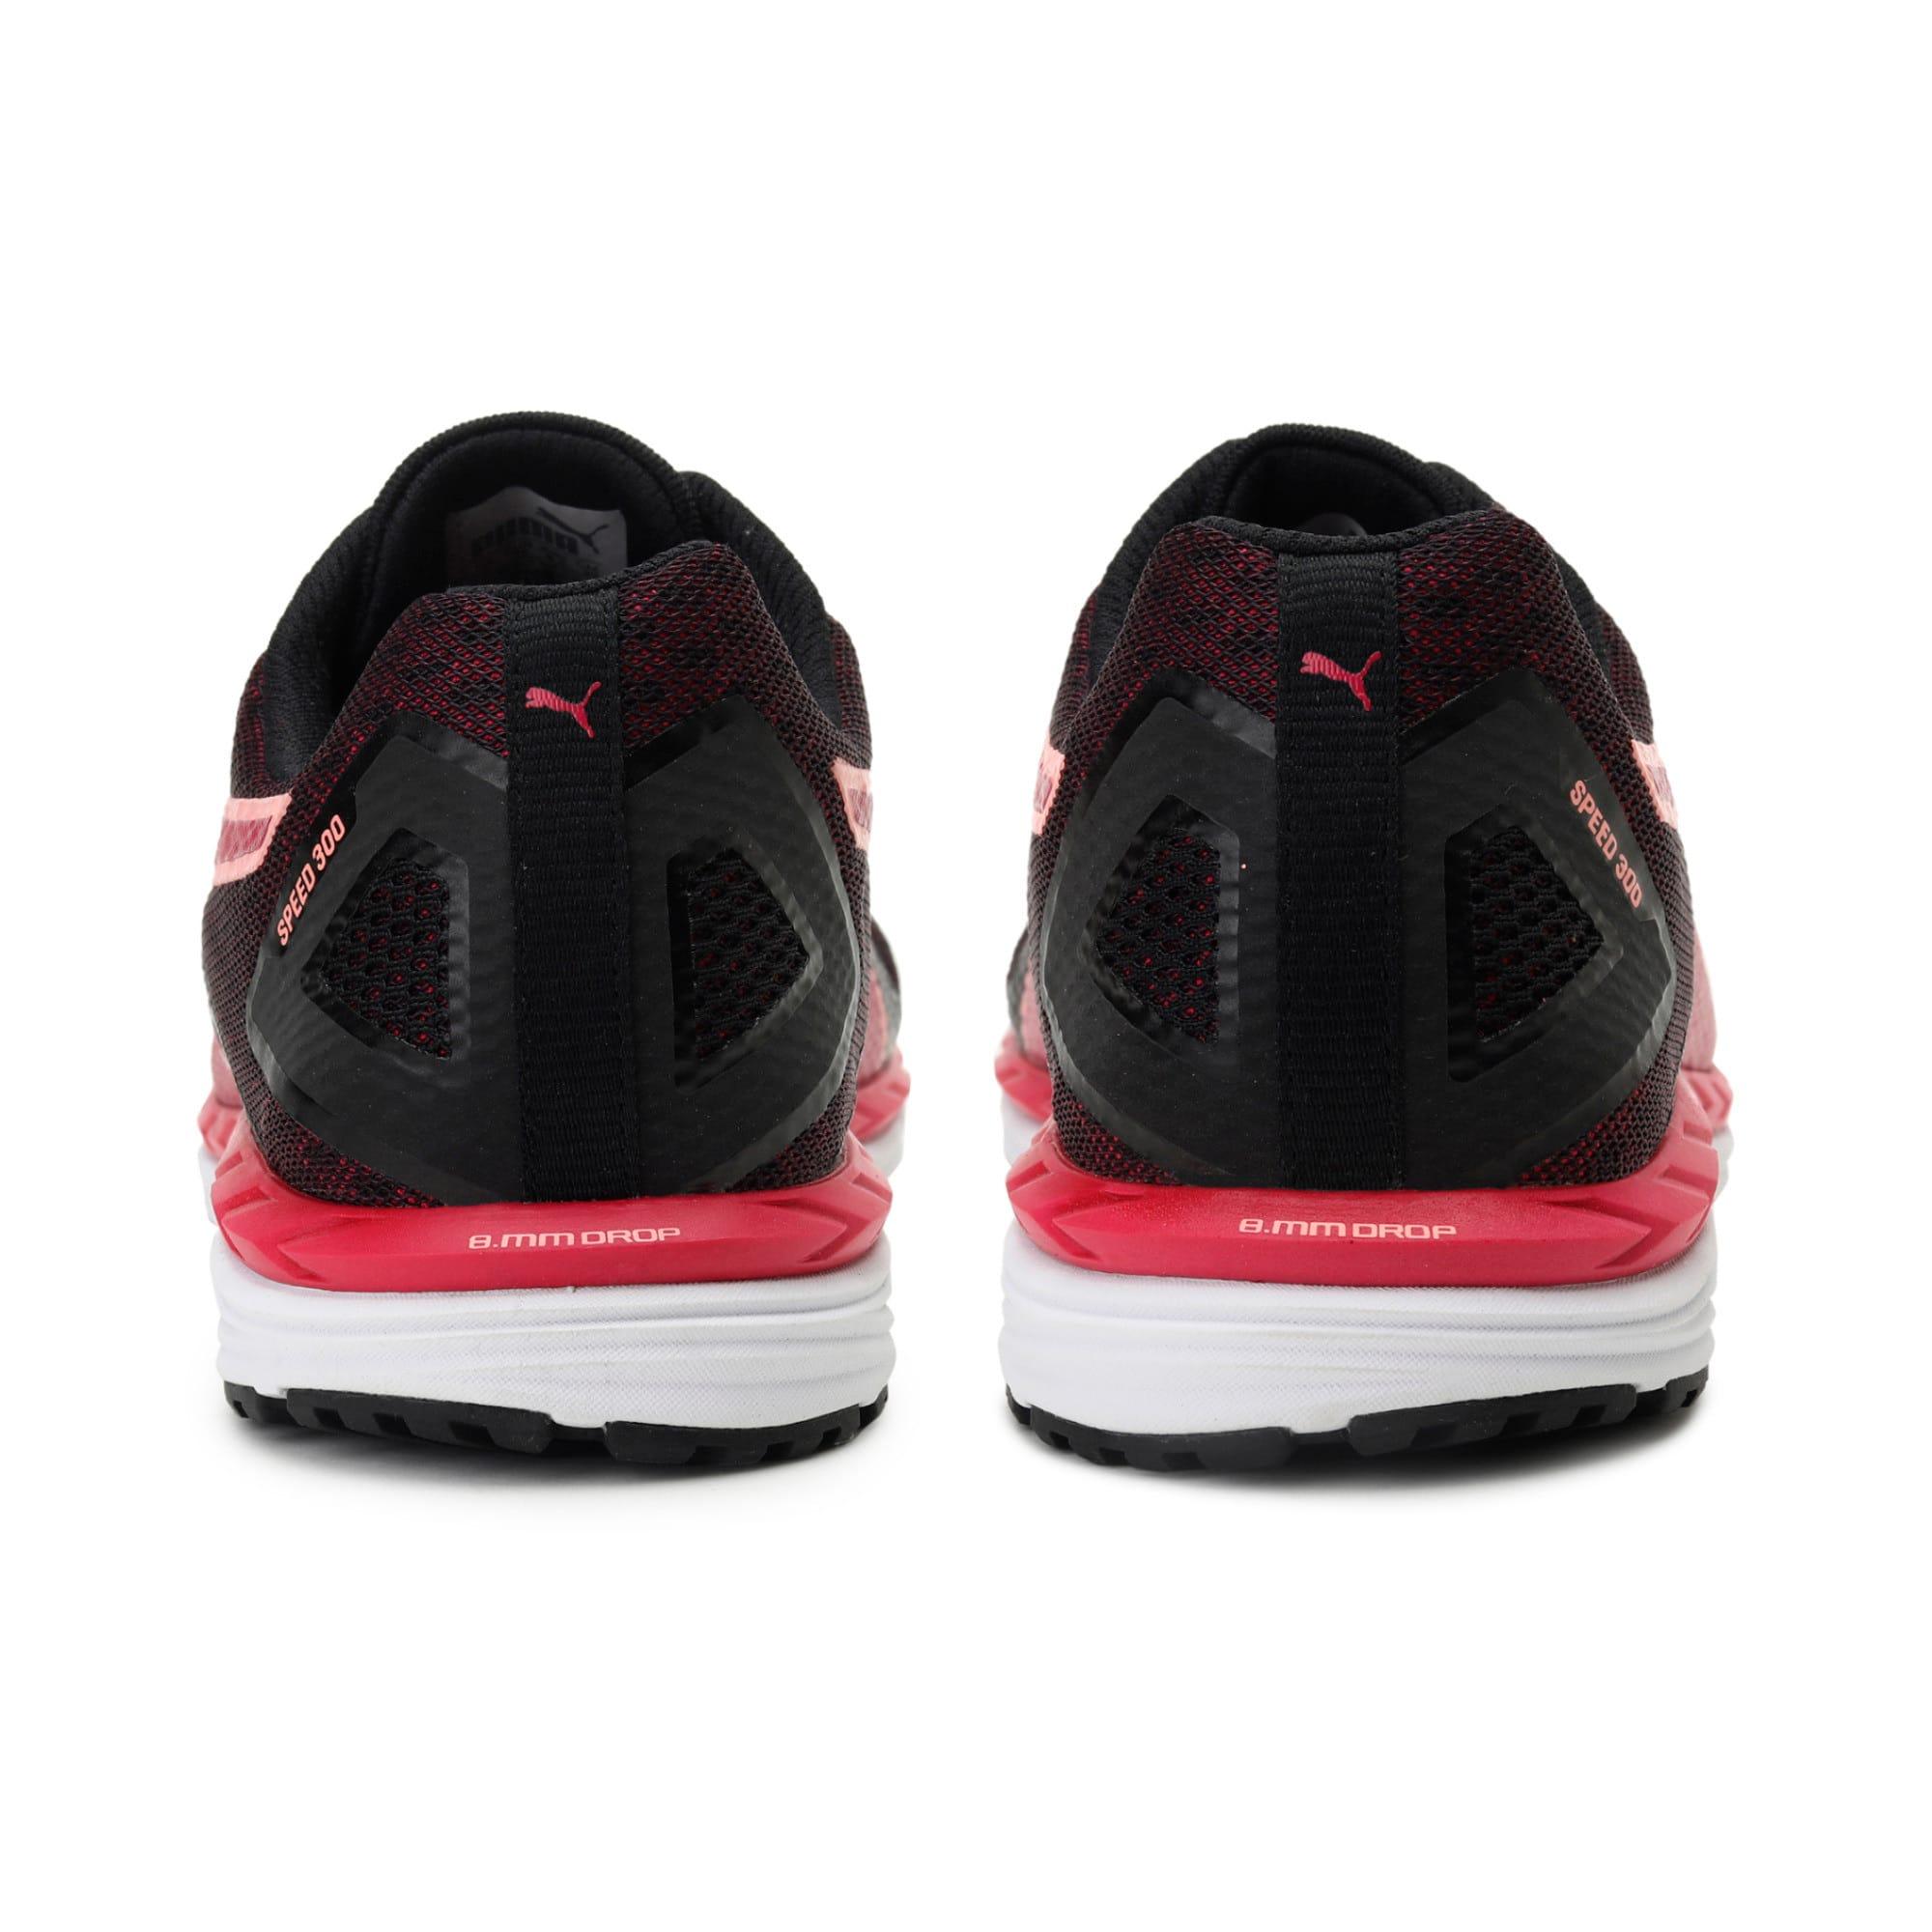 Thumbnail 4 of Speed 300 IGNITE 2 Women's Running Shoes, Love Potion-Puma Black, medium-IND